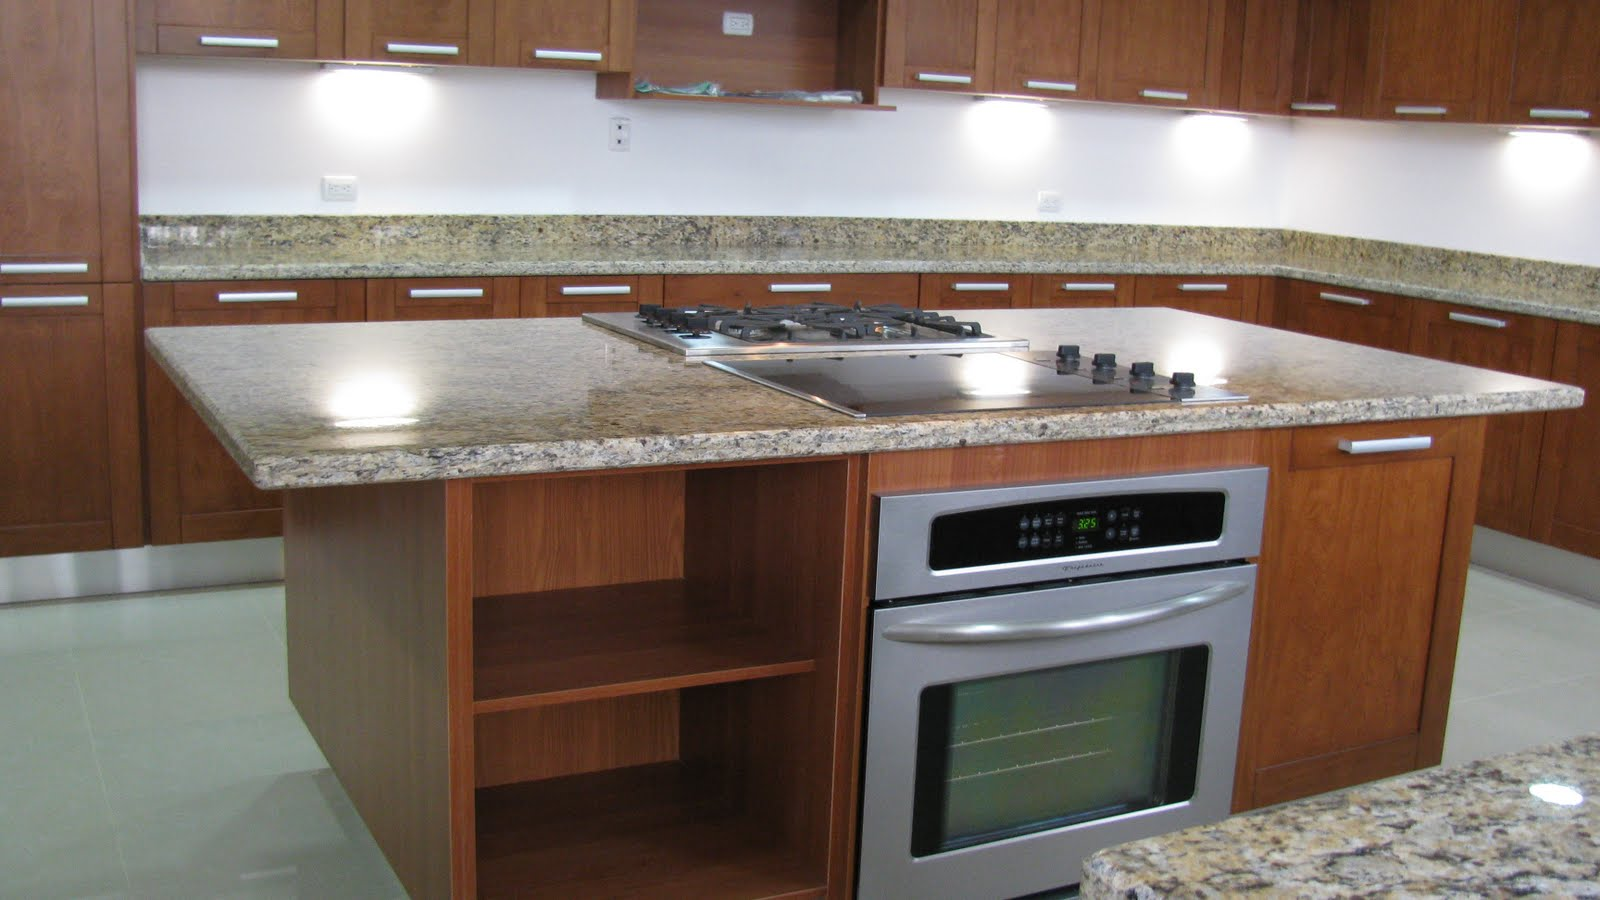 Accesorios muebles cocina costa rica - Accesorios muebles cocina ...